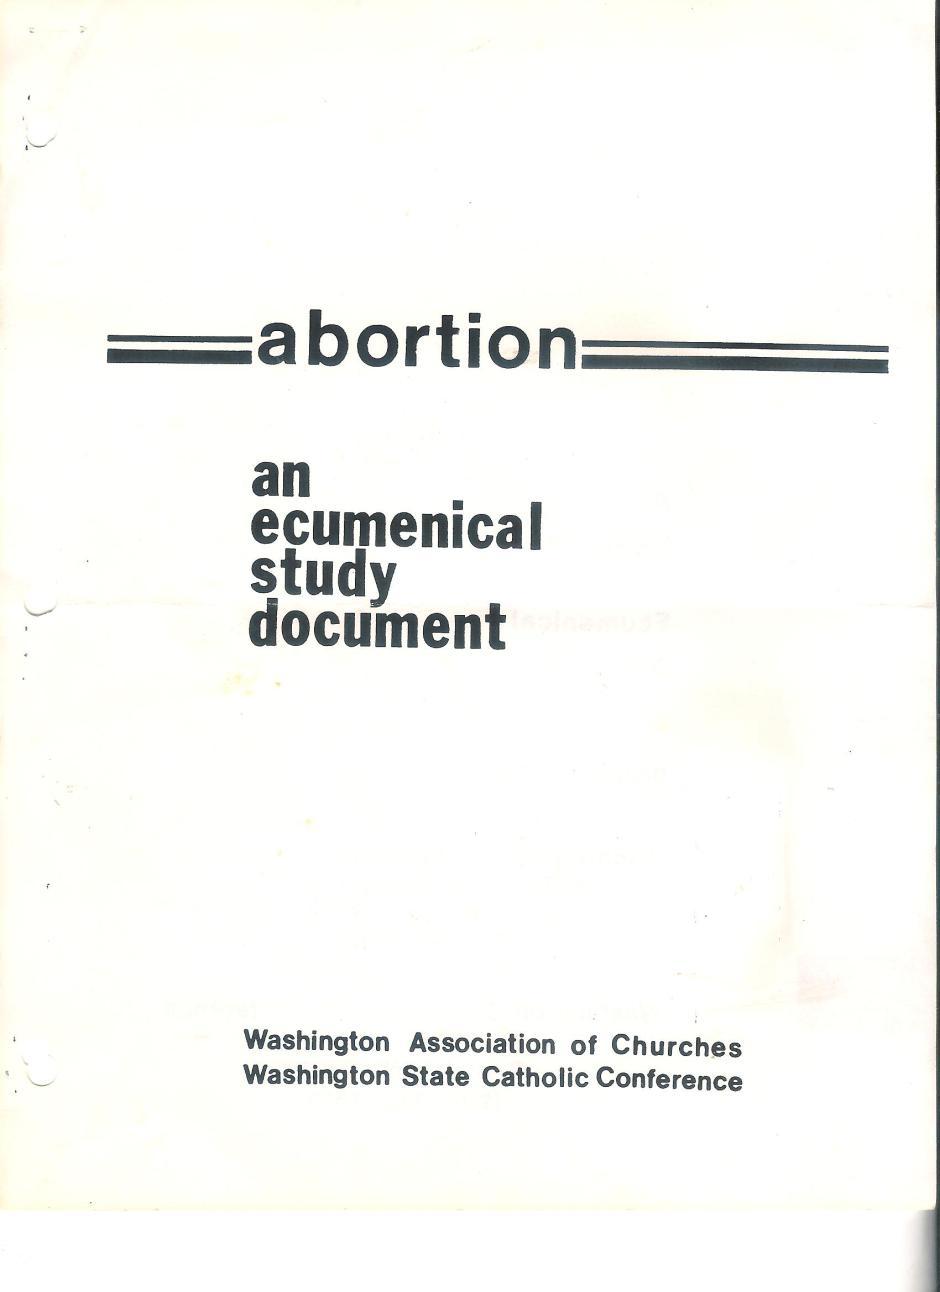 Abortion Study Doc 1